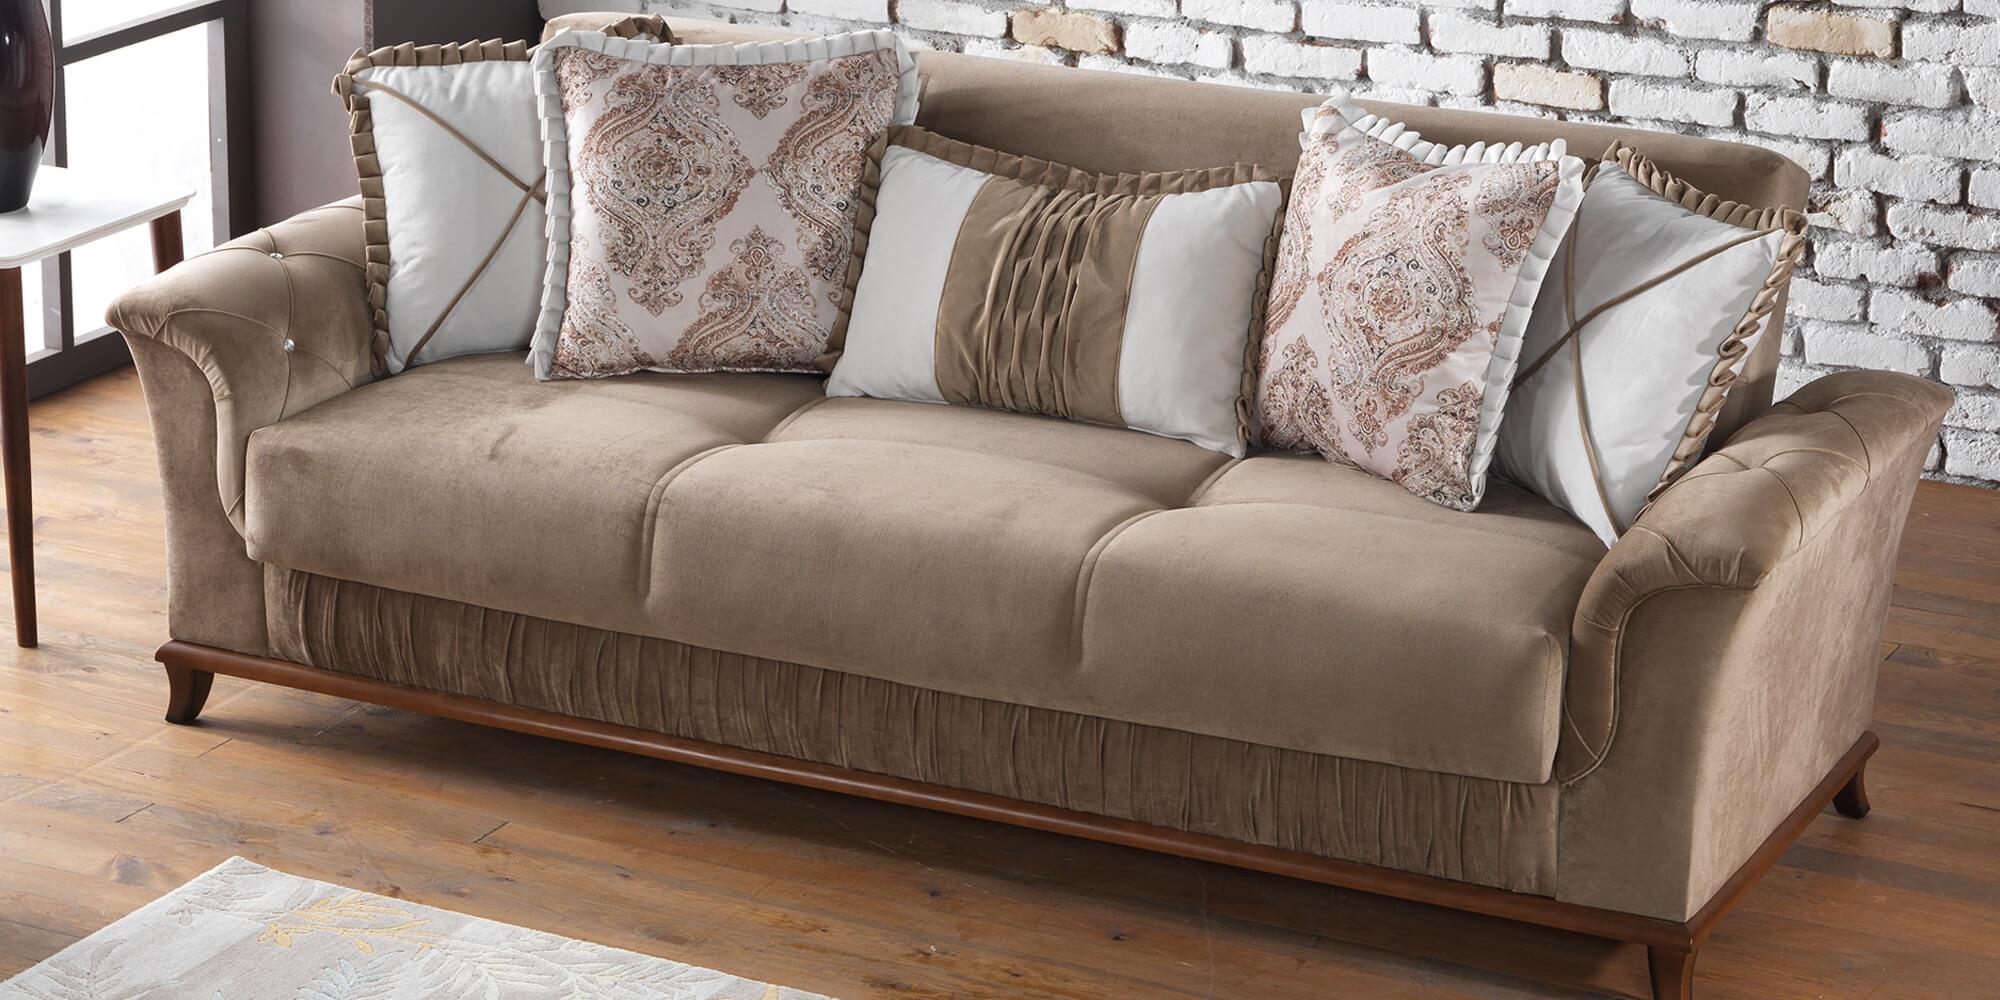 kristal 3 2 1 delux sofa set yuvam m belhaus in wuppertal cilek offizieller h ndler in europa. Black Bedroom Furniture Sets. Home Design Ideas